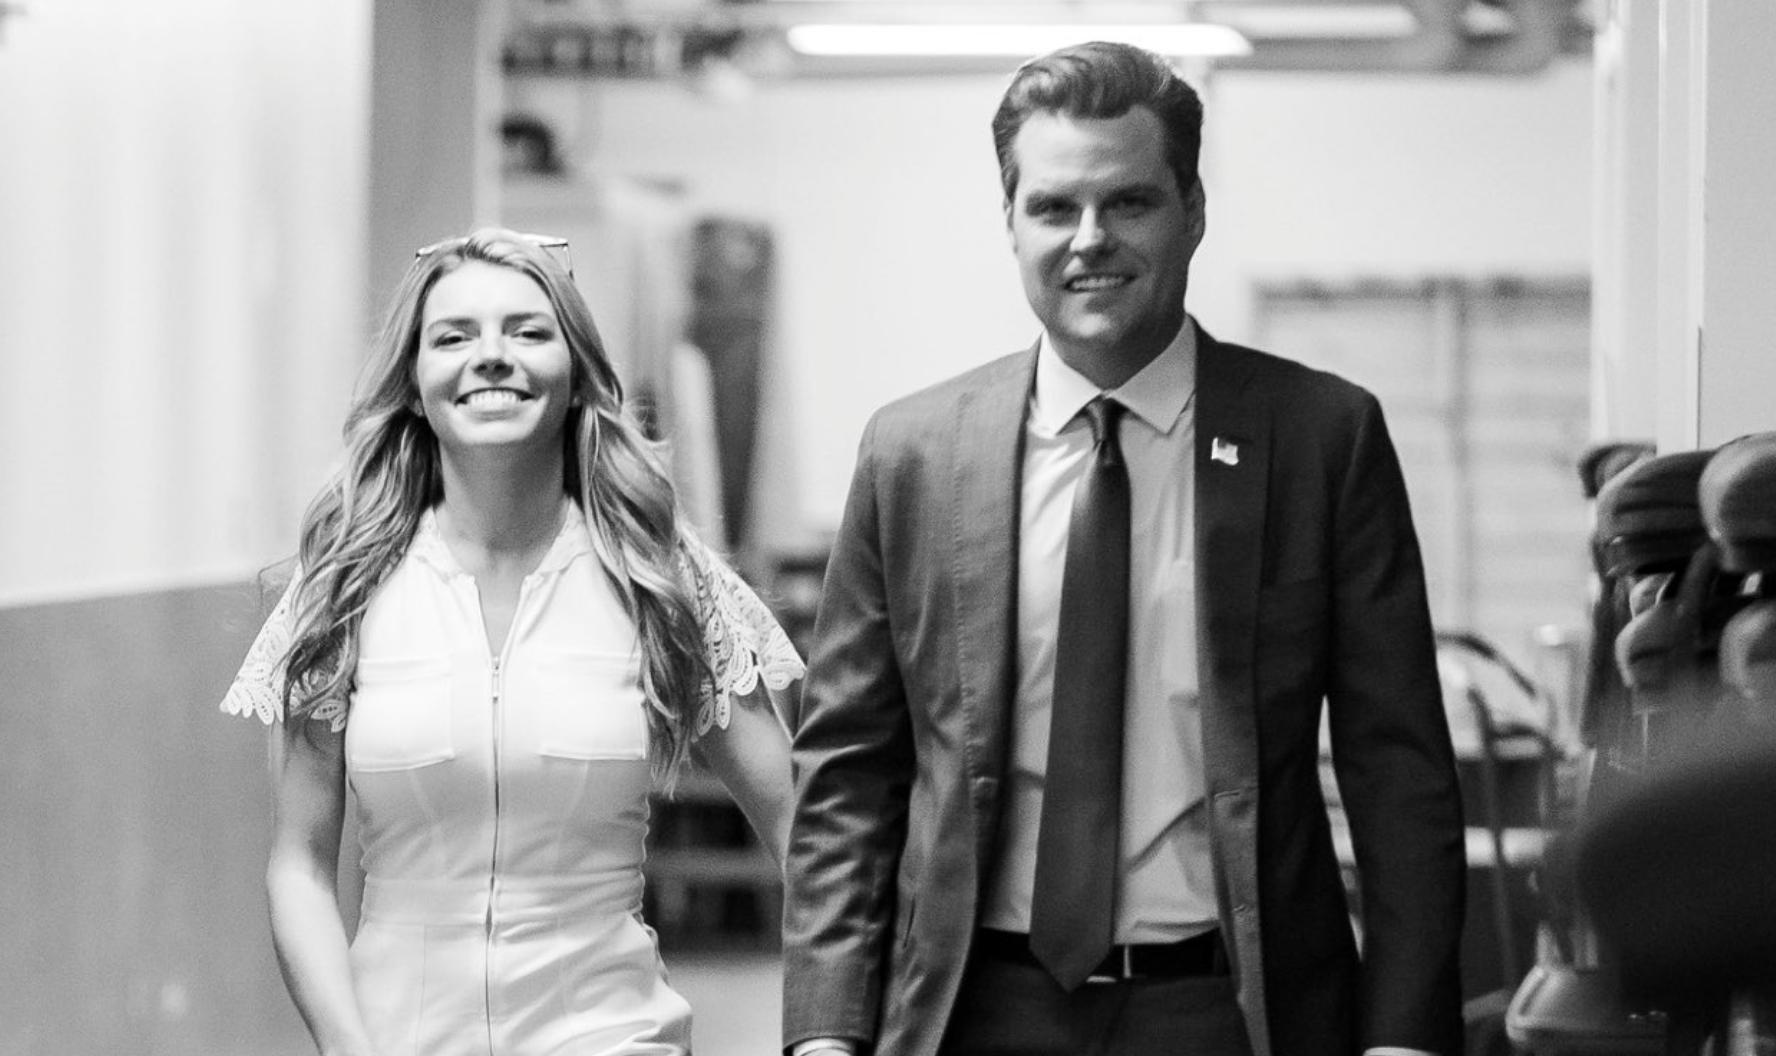 Miami Herald Reporter Insinuates Gaetz's Wedding was Staged